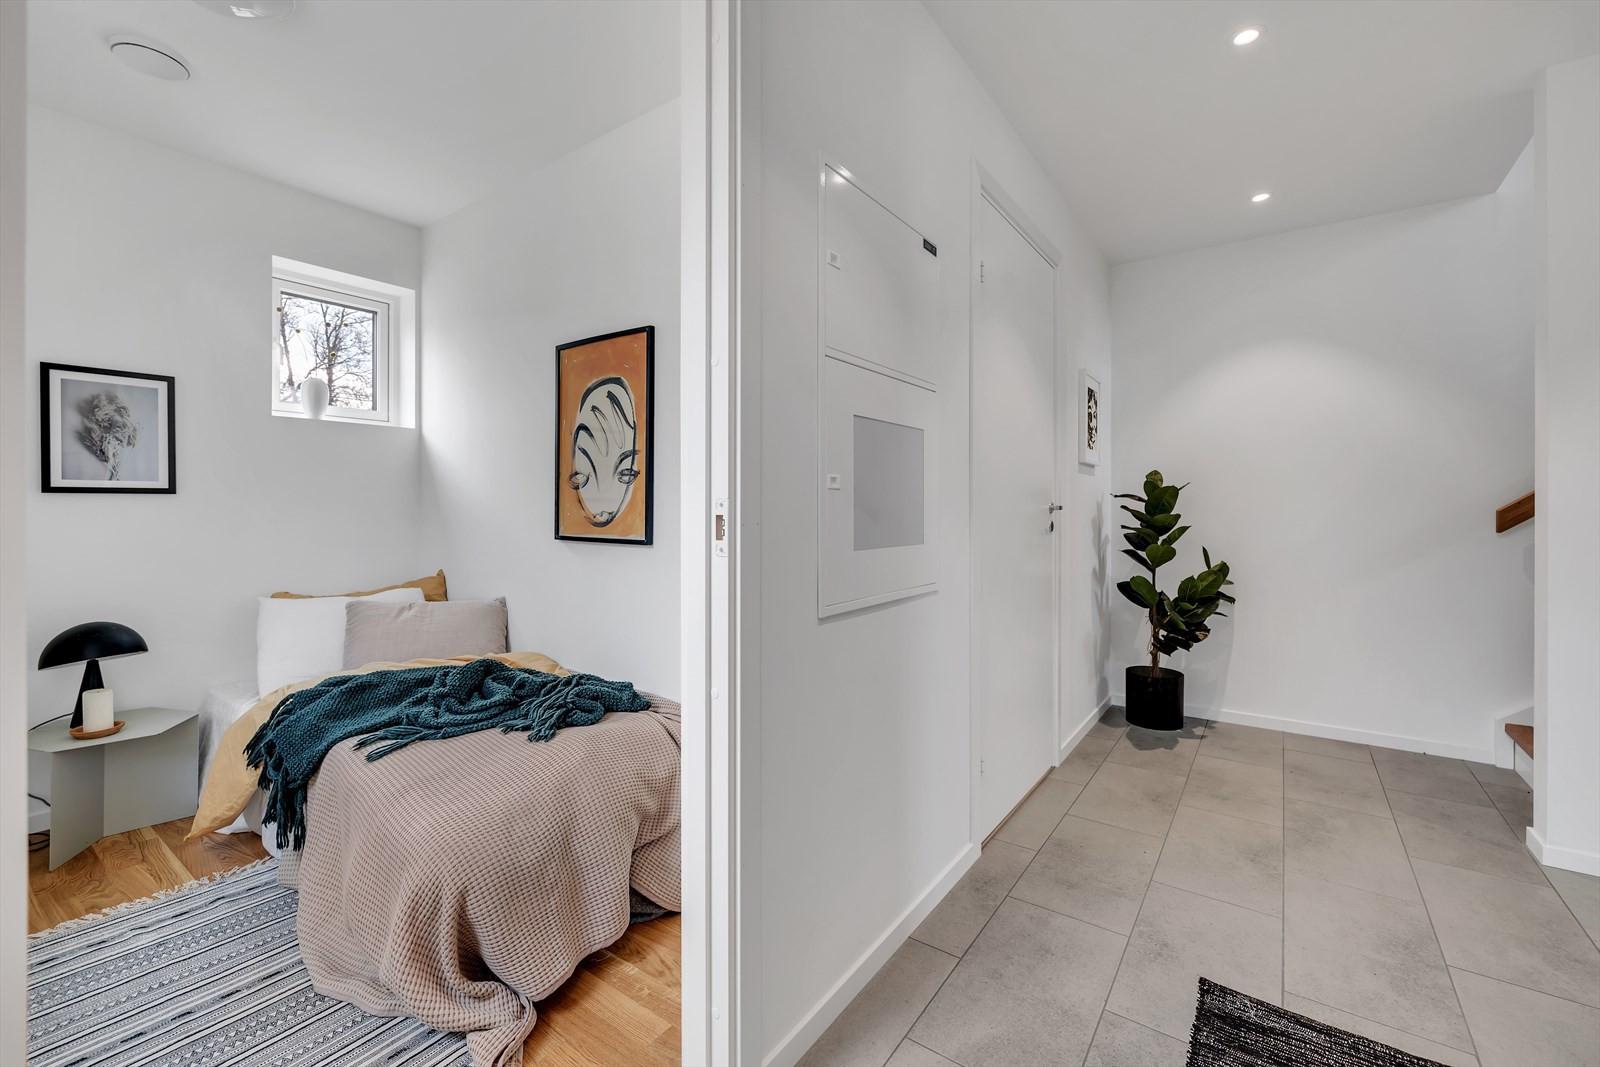 Gangen leder deg til 3 soverom, trappegang og bad/wc/vask